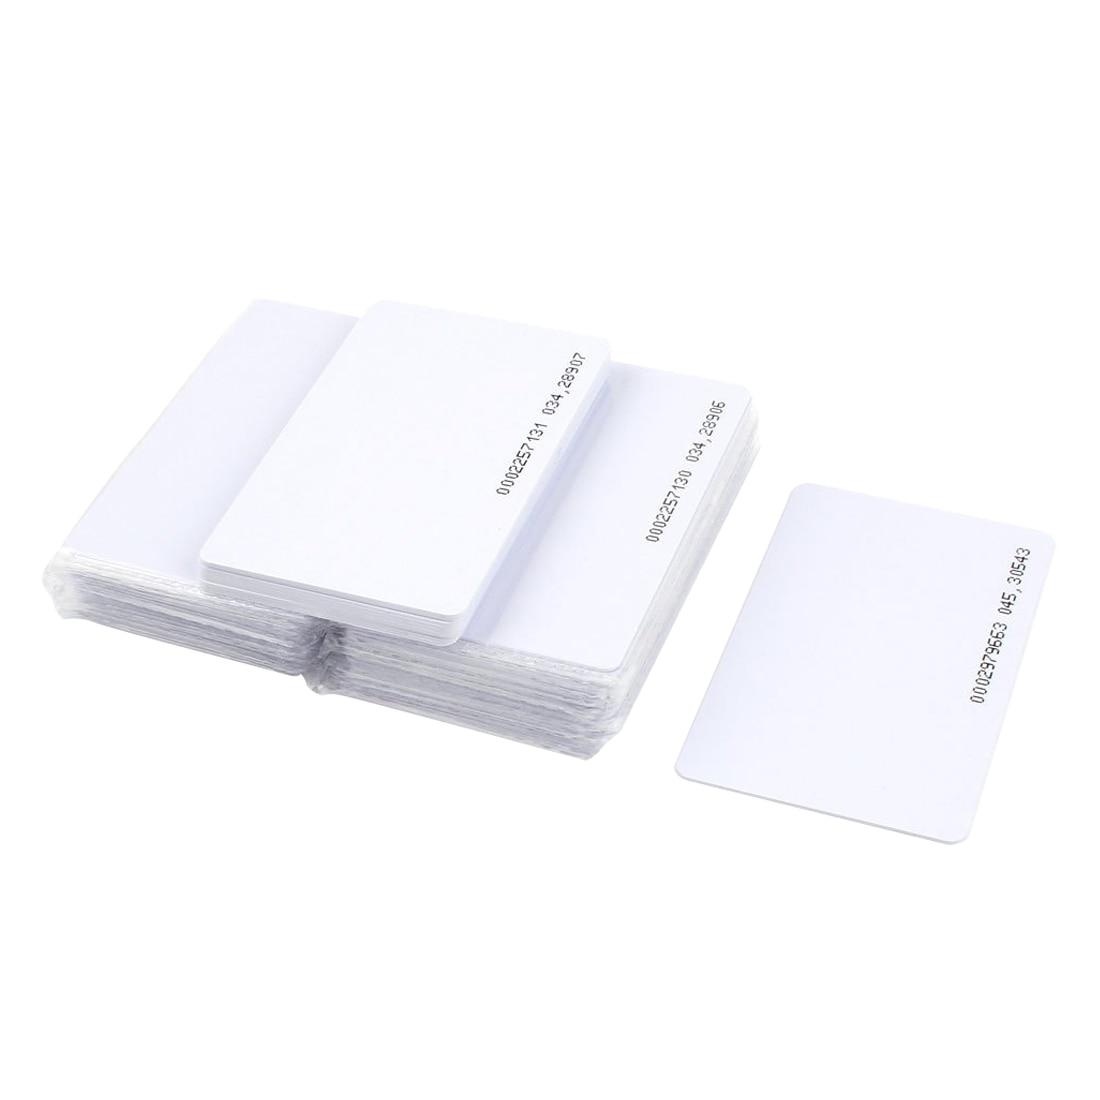 MOOL 50 Pieces Intelligent Proximity EM4100 125kHz RFID Proximity Card Entry Empty ID Access